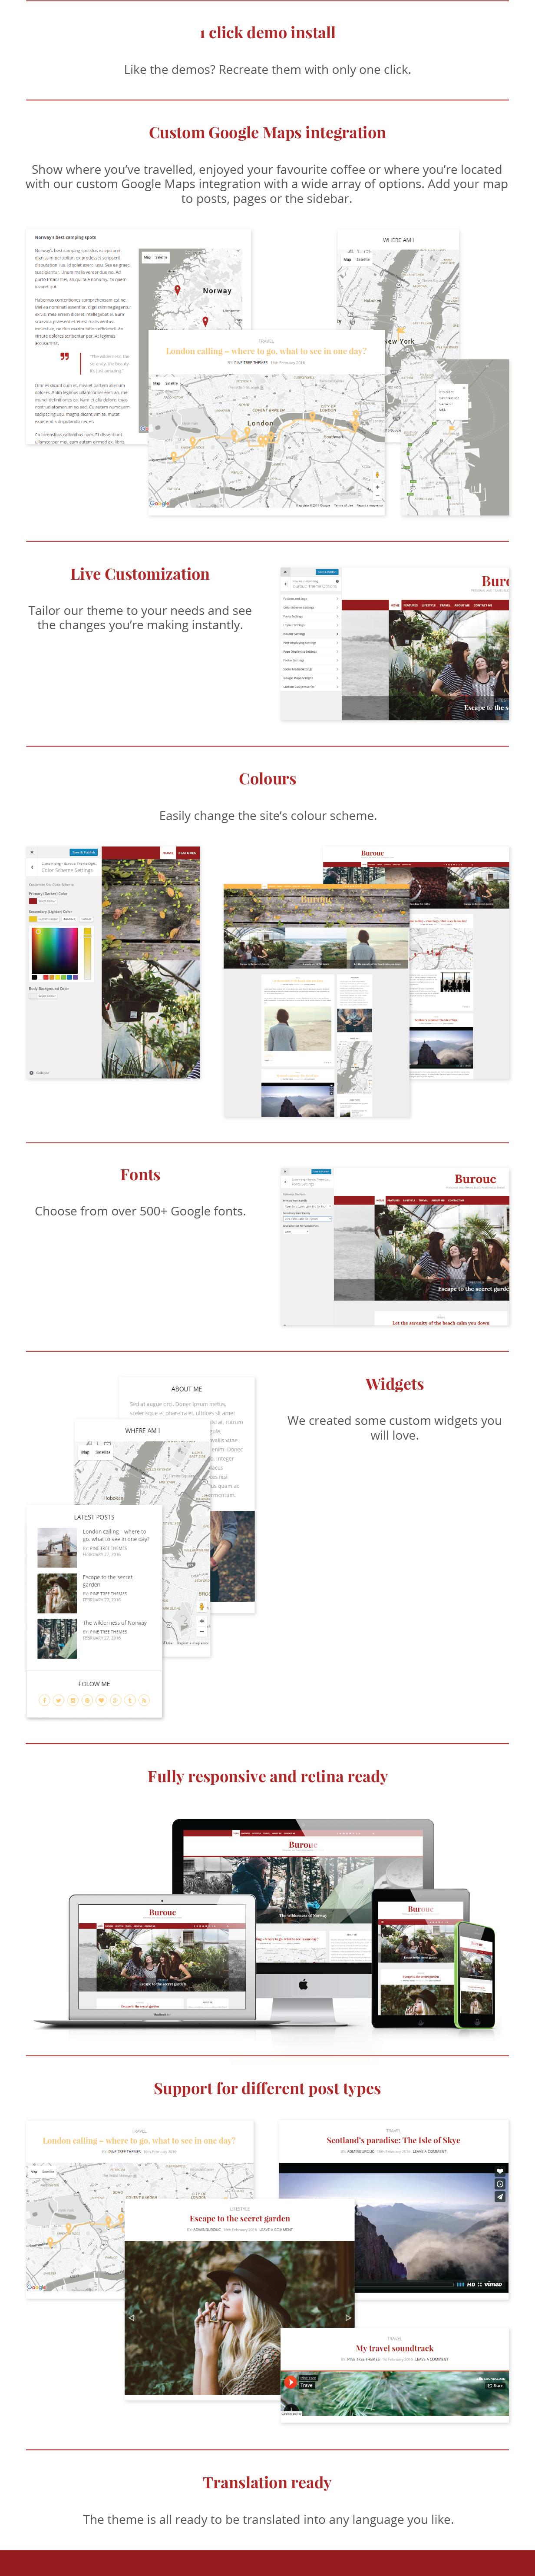 Burouc - Personal and Travel Blog WordPress Theme - 2